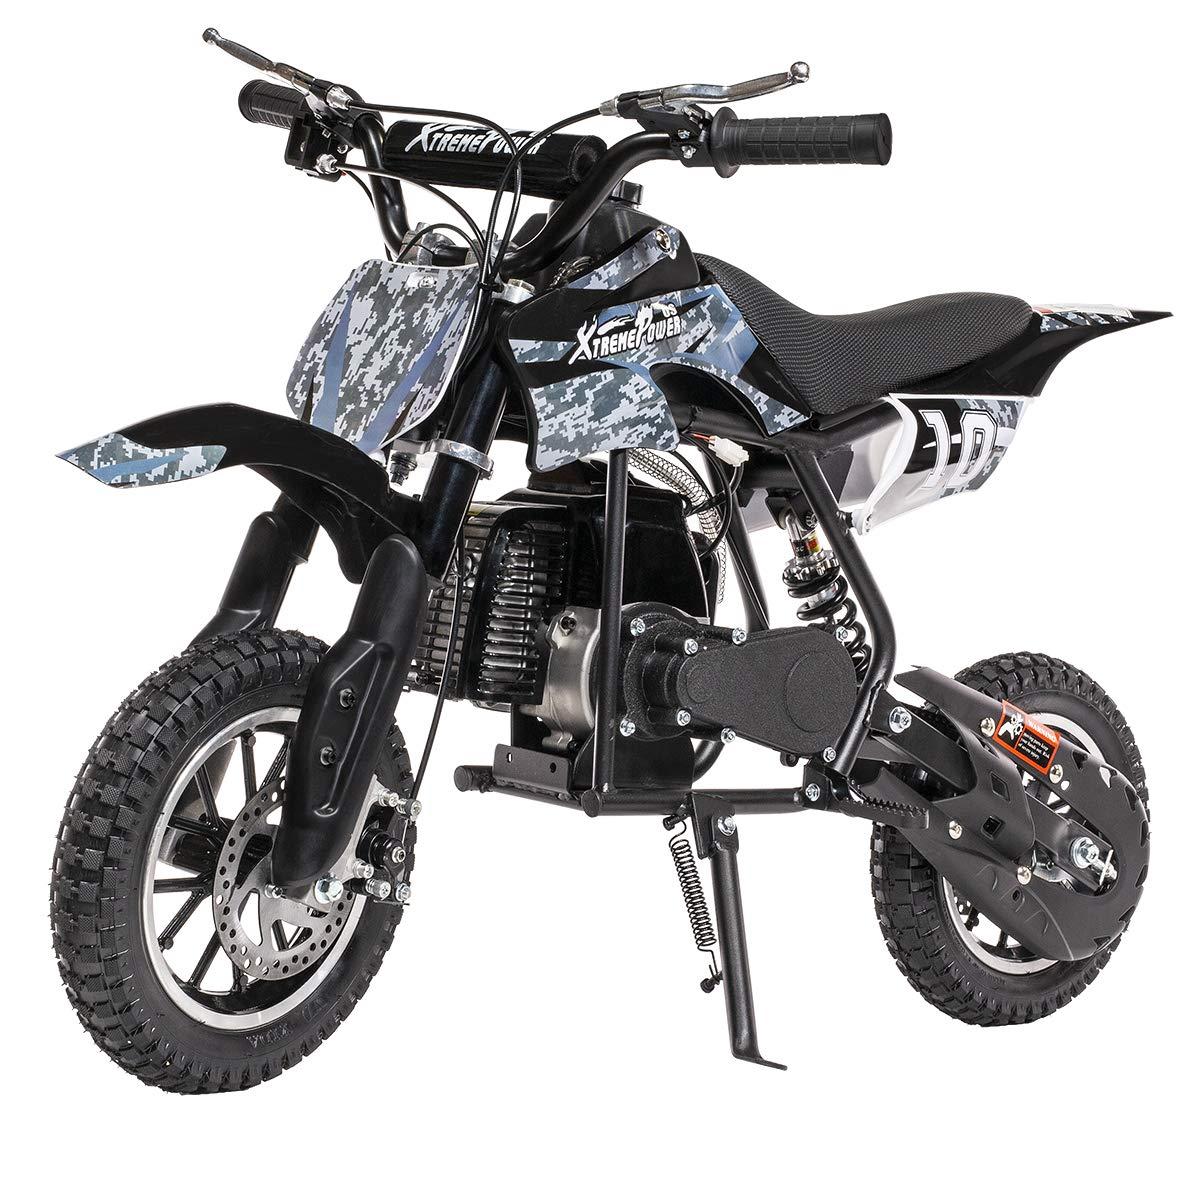 Xtremepower 49cc Kids Dirt Bike